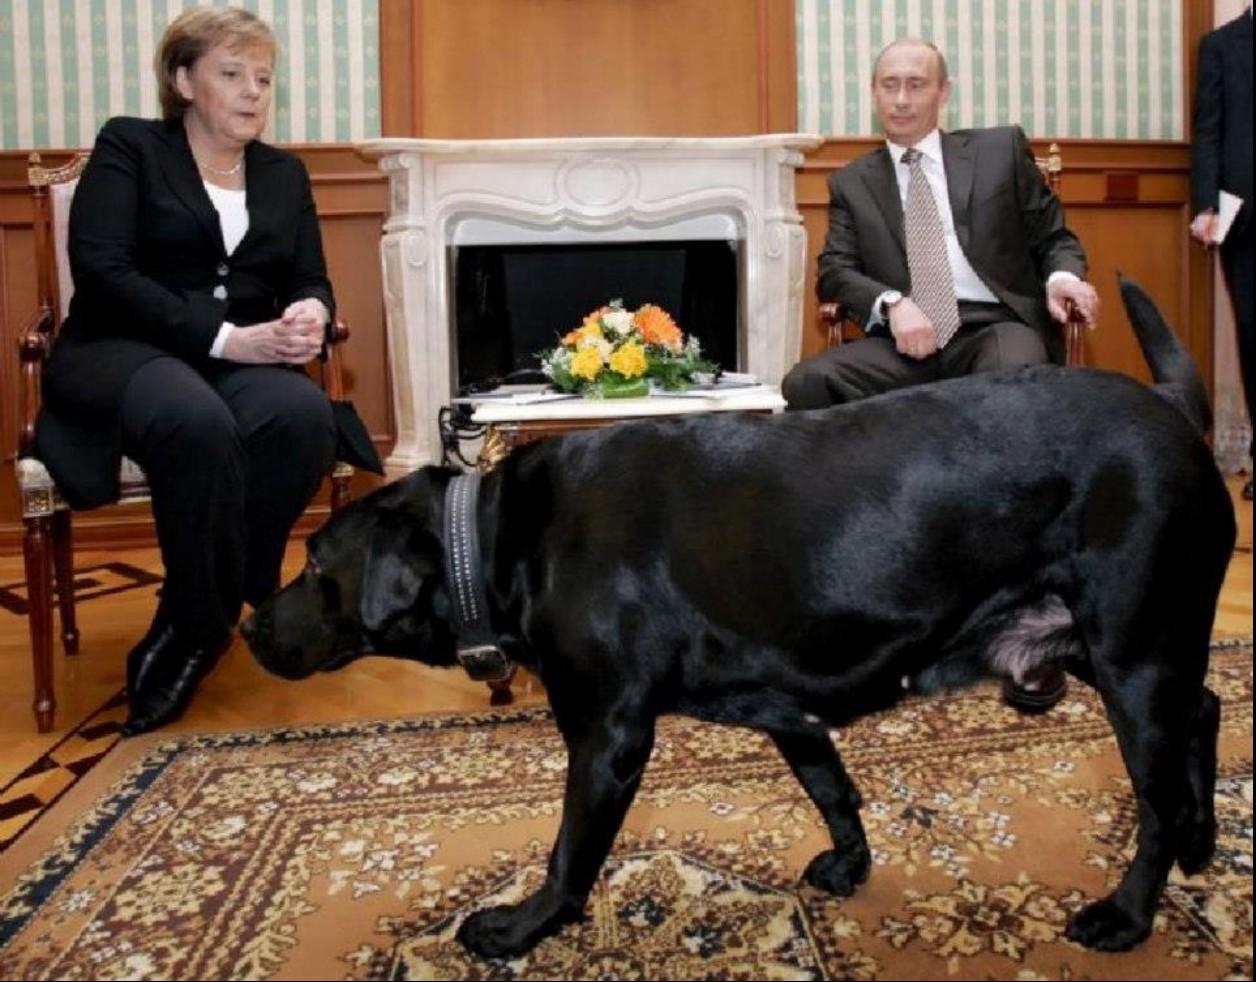 Putin-Merkel  0--a-cadela-e-Merkel